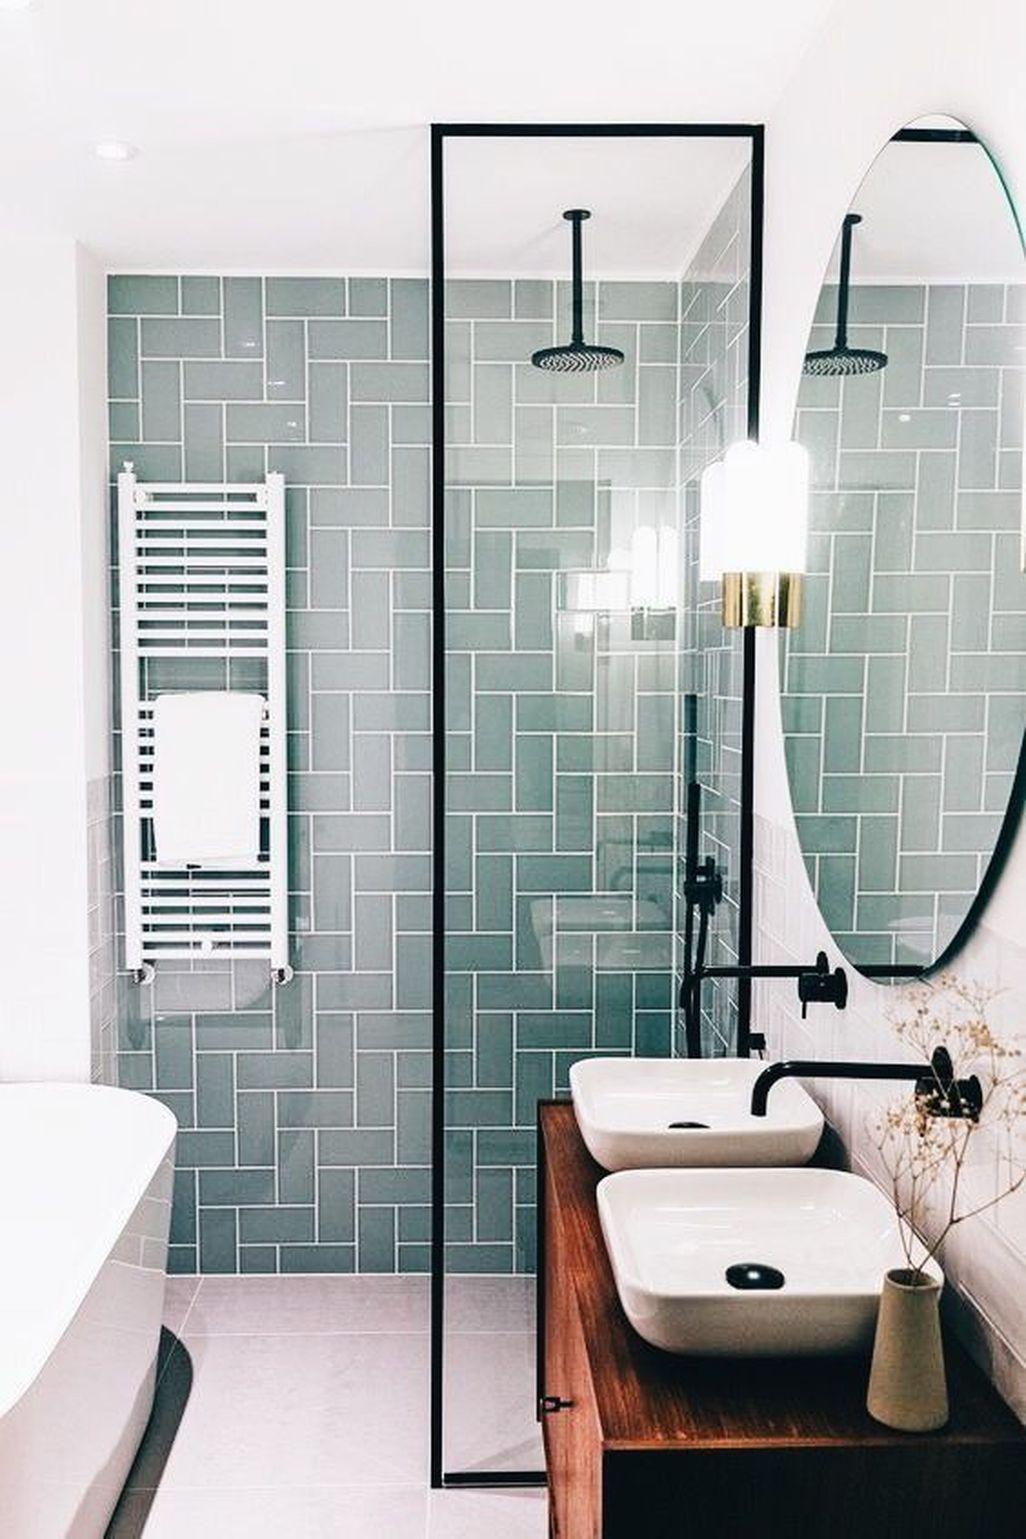 46 Rustic Small Bathroom Wood Decor Design Will Inspire